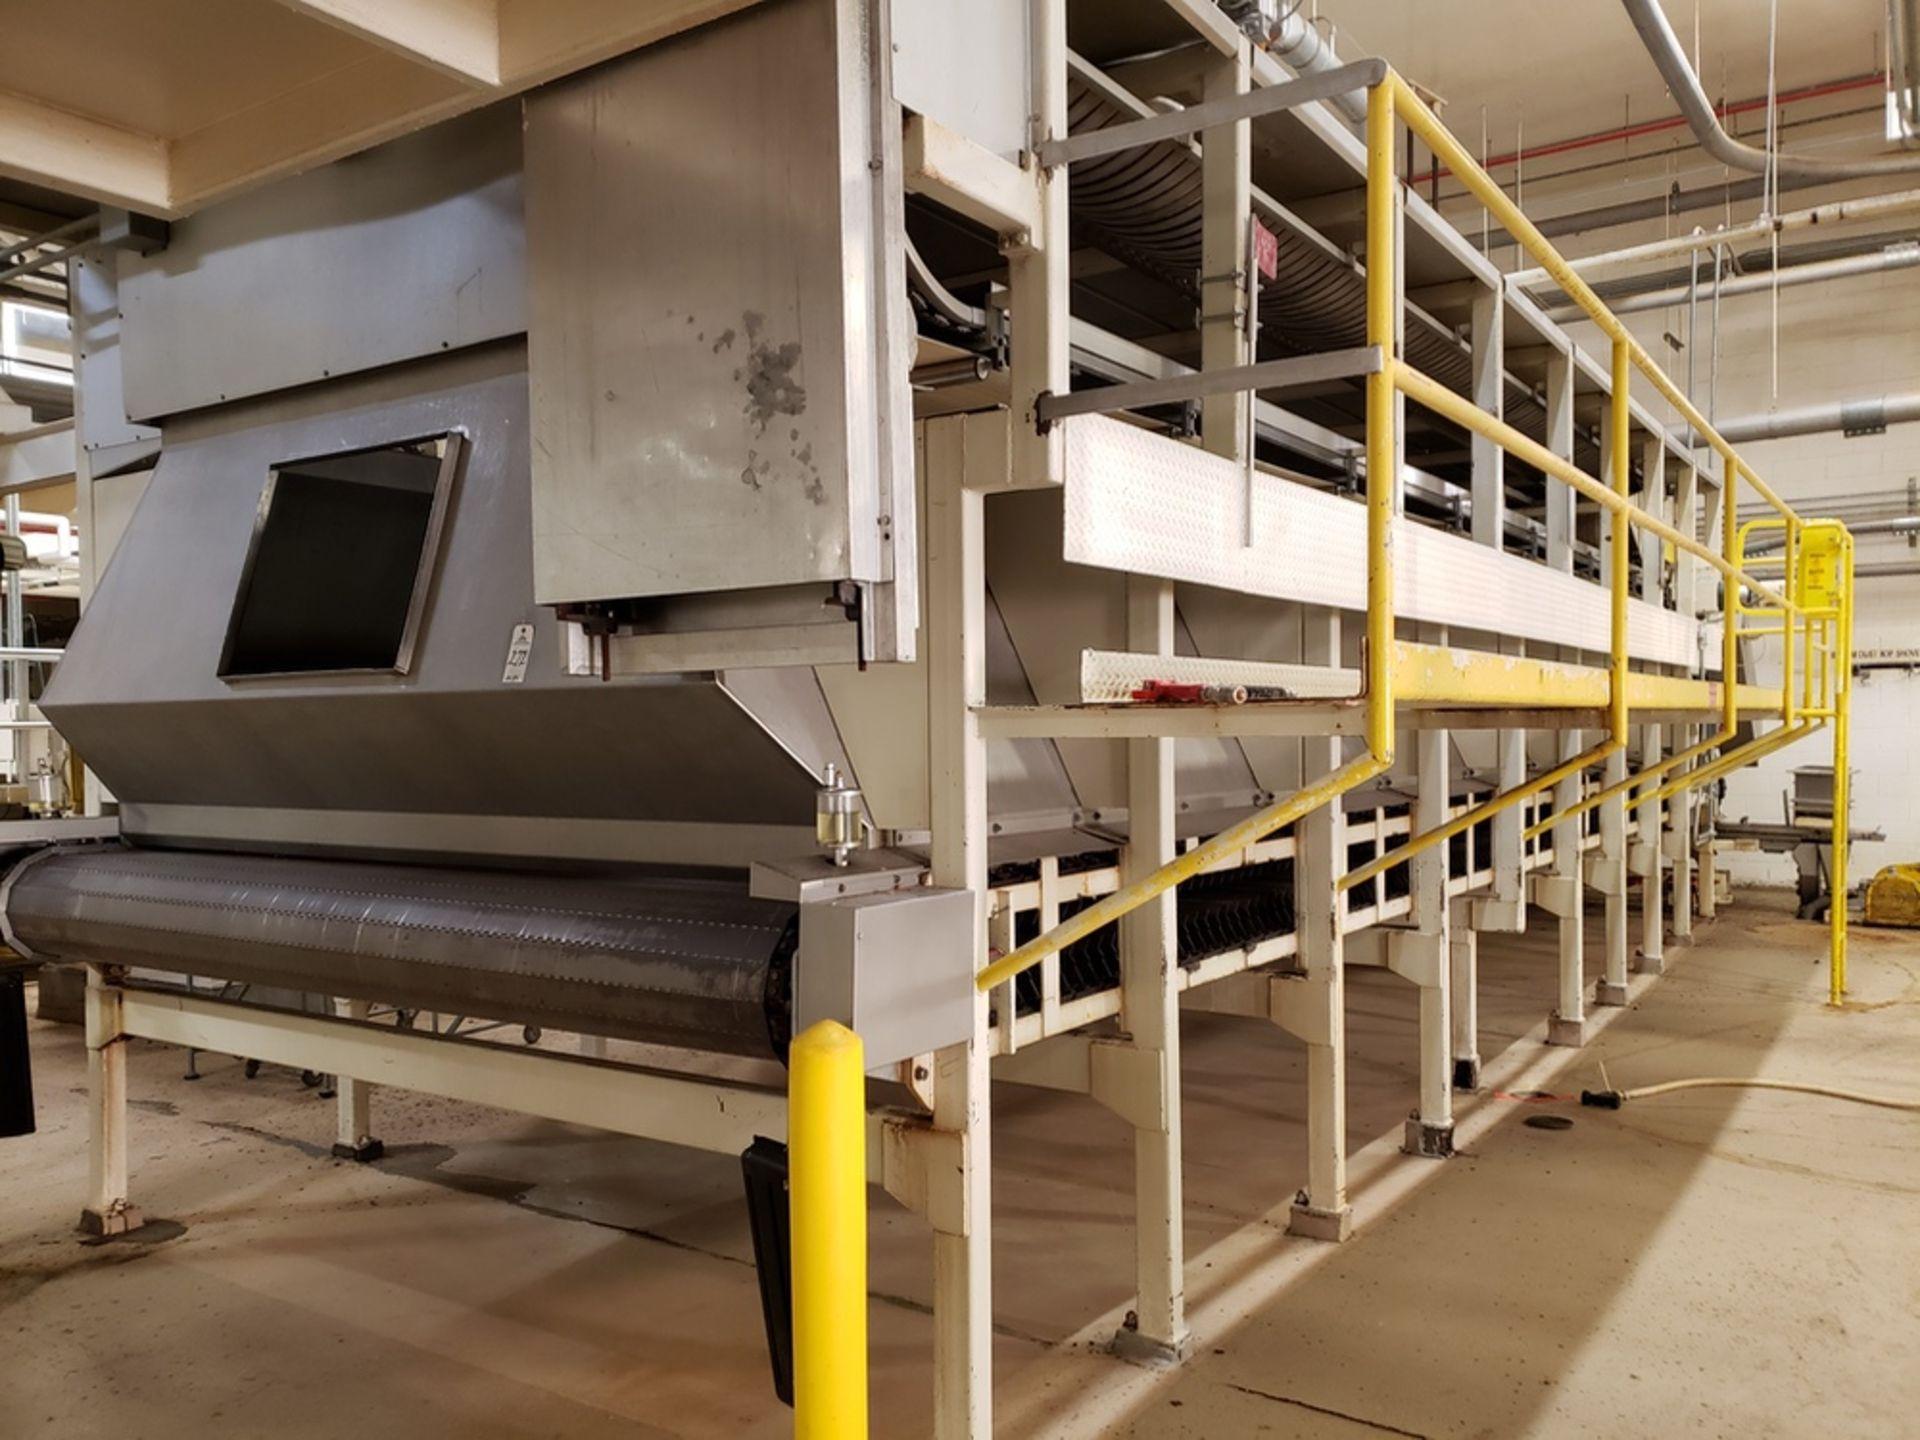 Lot 272 - 10' X 40' Grain Drying/Surge Bin, W/ Leveling Screws | Rig Fee: $7500